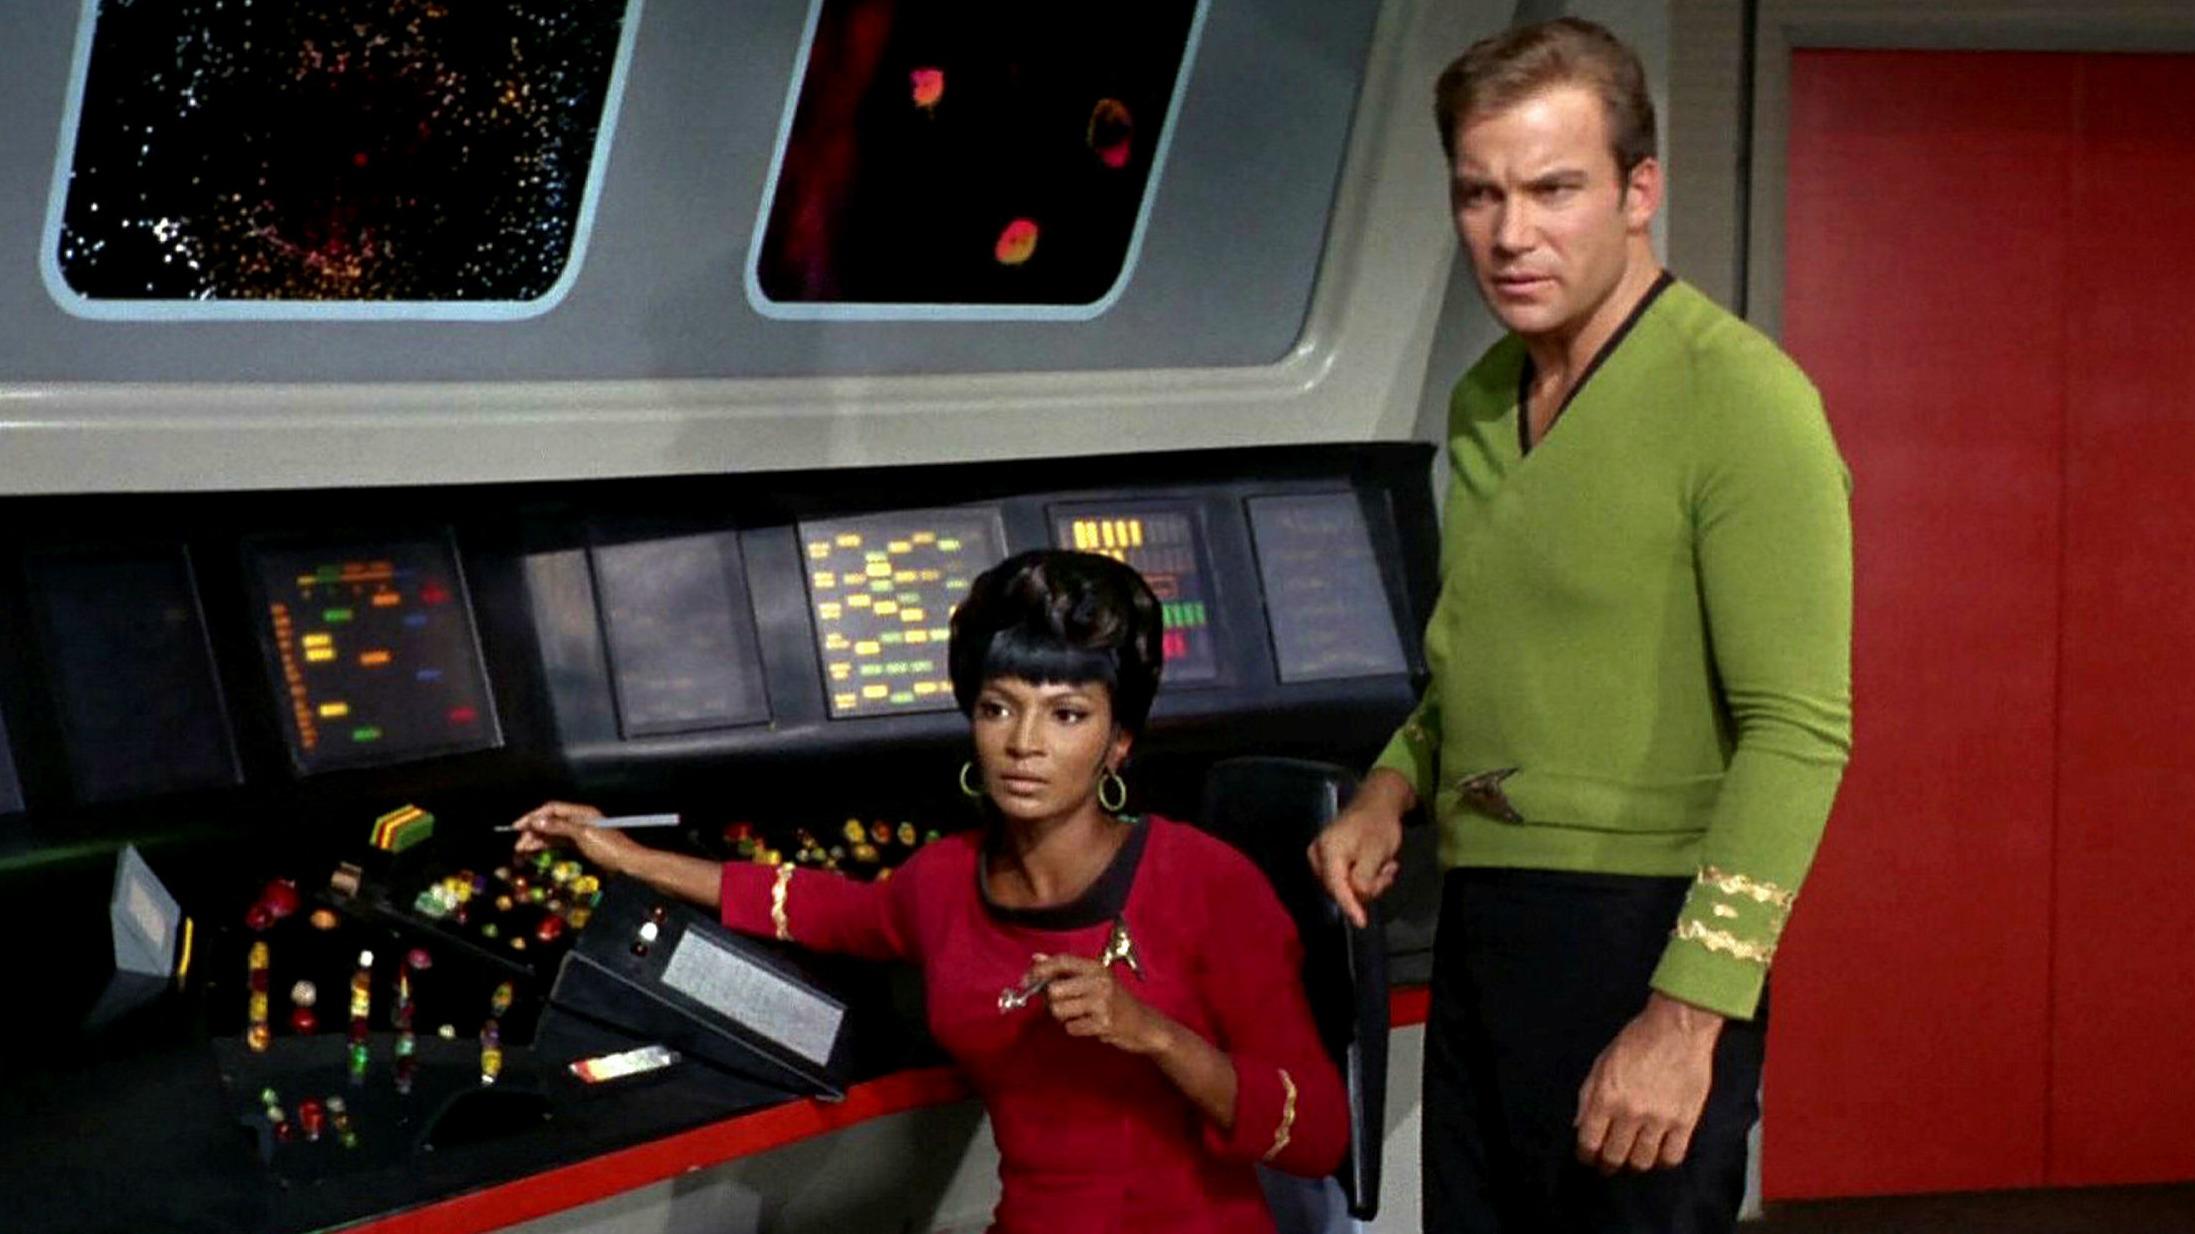 An Agile Uk Civil Service Needs More Than Star Trek Screens Financial Times